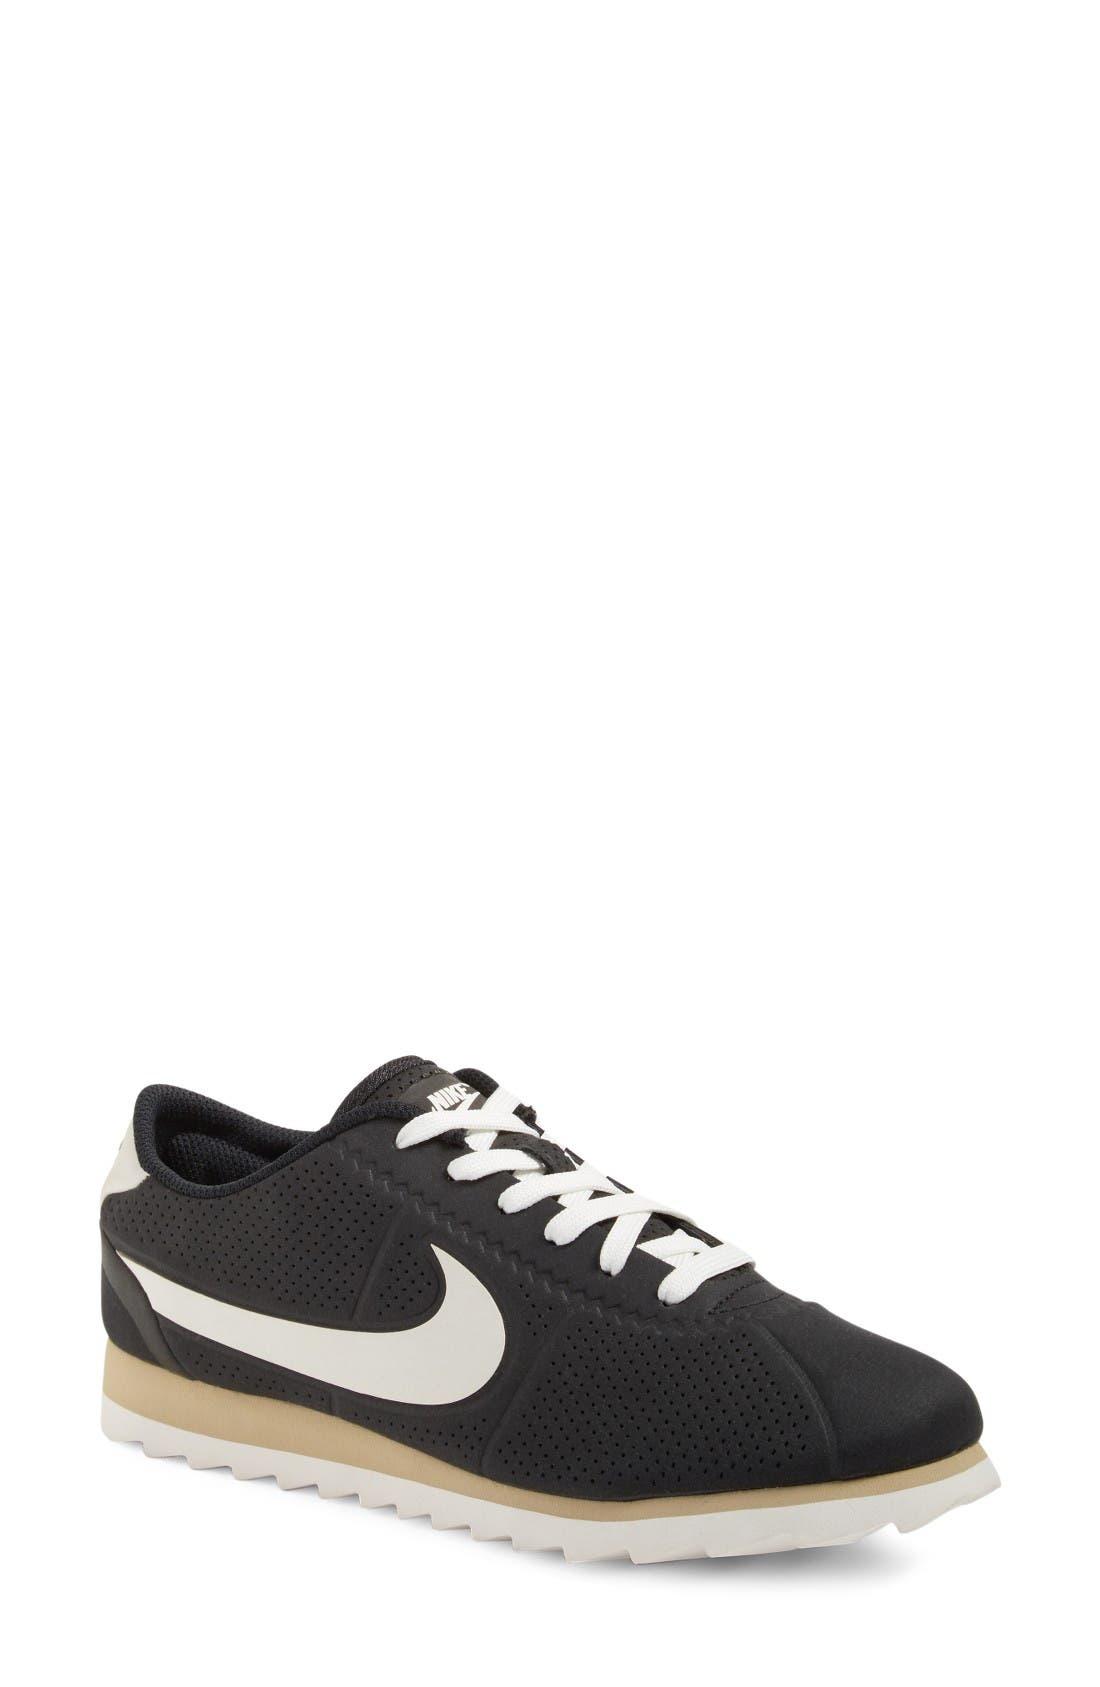 Alternate Image 1 Selected - Nike 'Cortez Ultra Moire' Sneaker (Women)